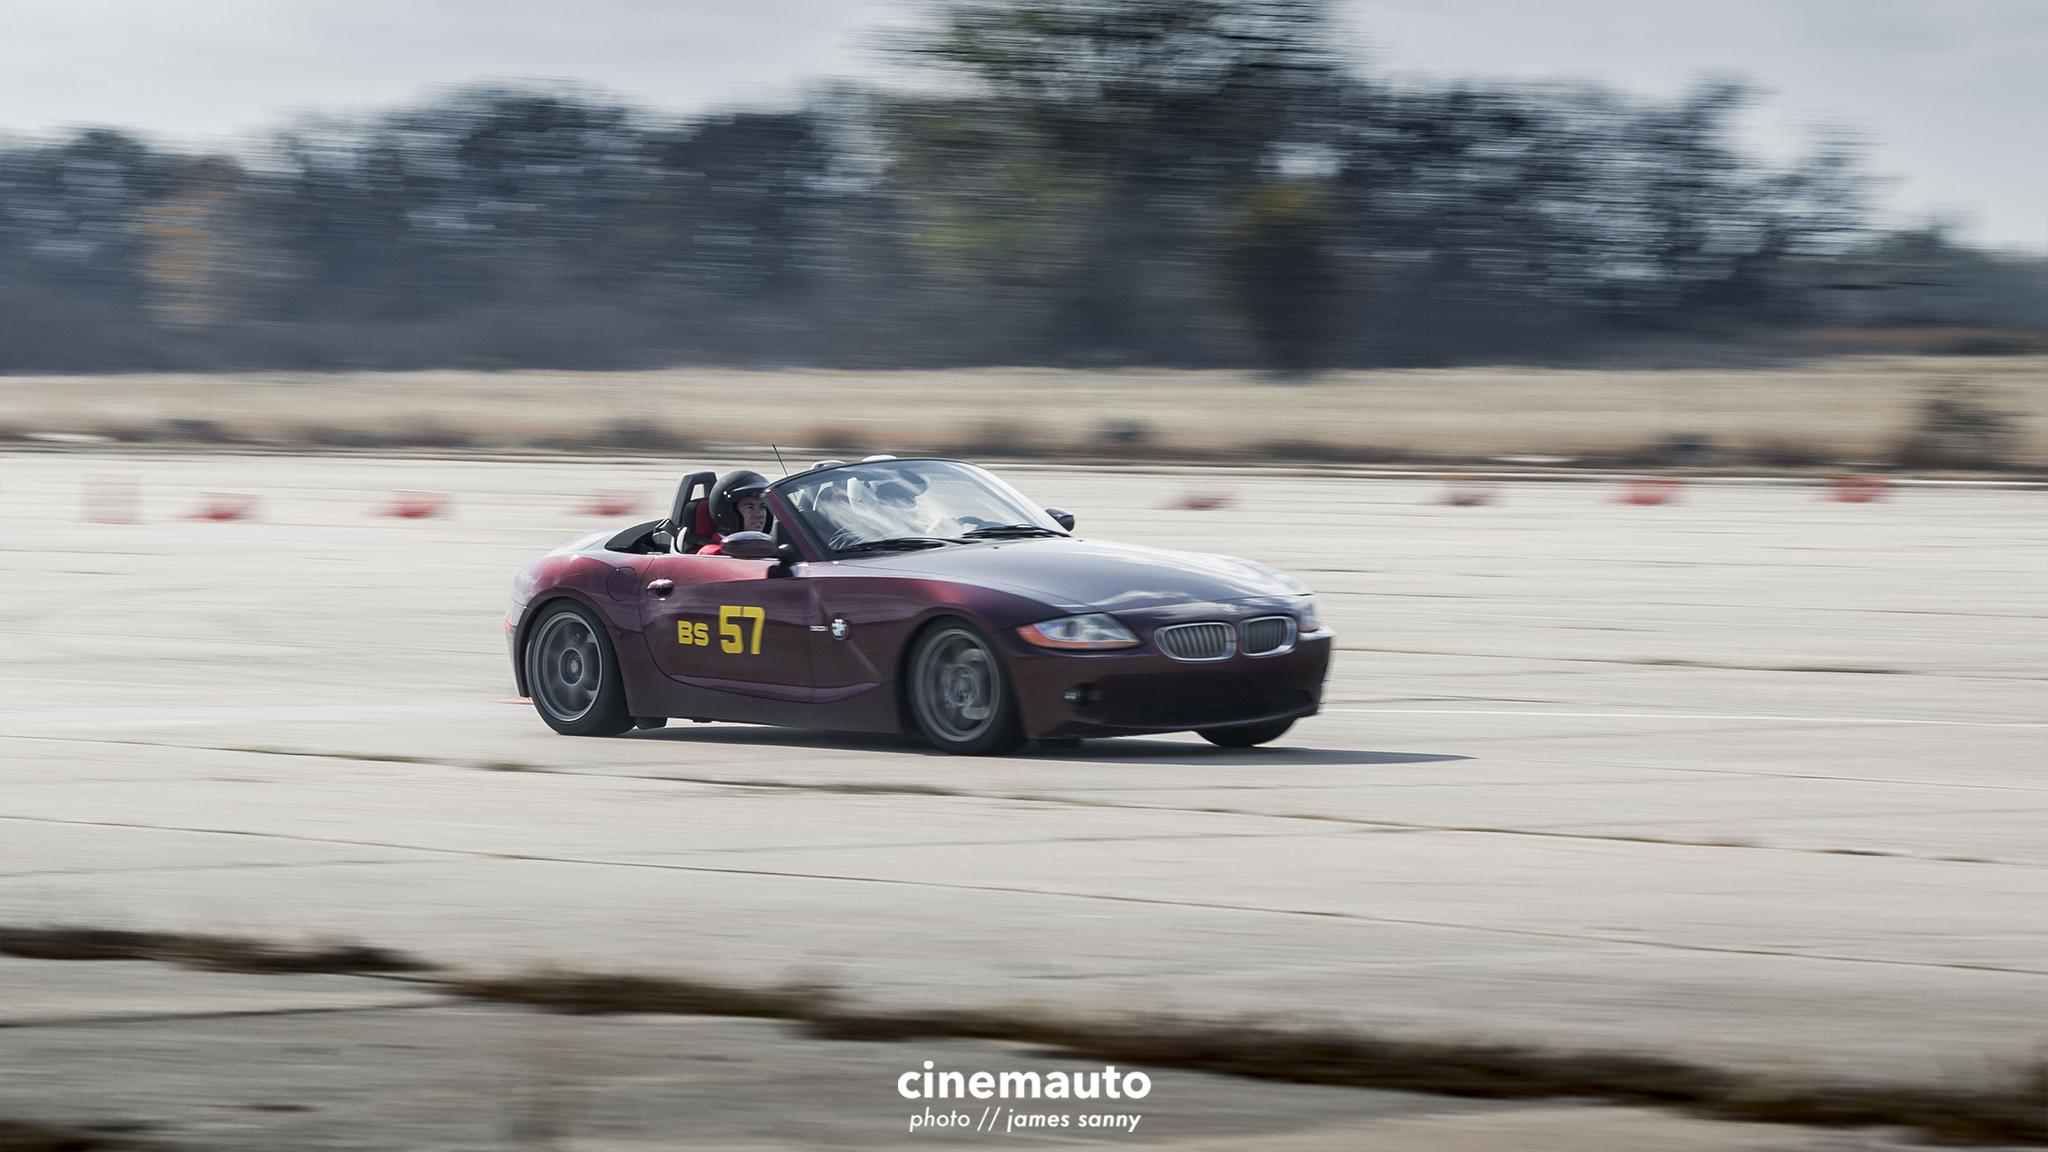 wichita-automotive-photographer-james-sanny-scca21.jpg